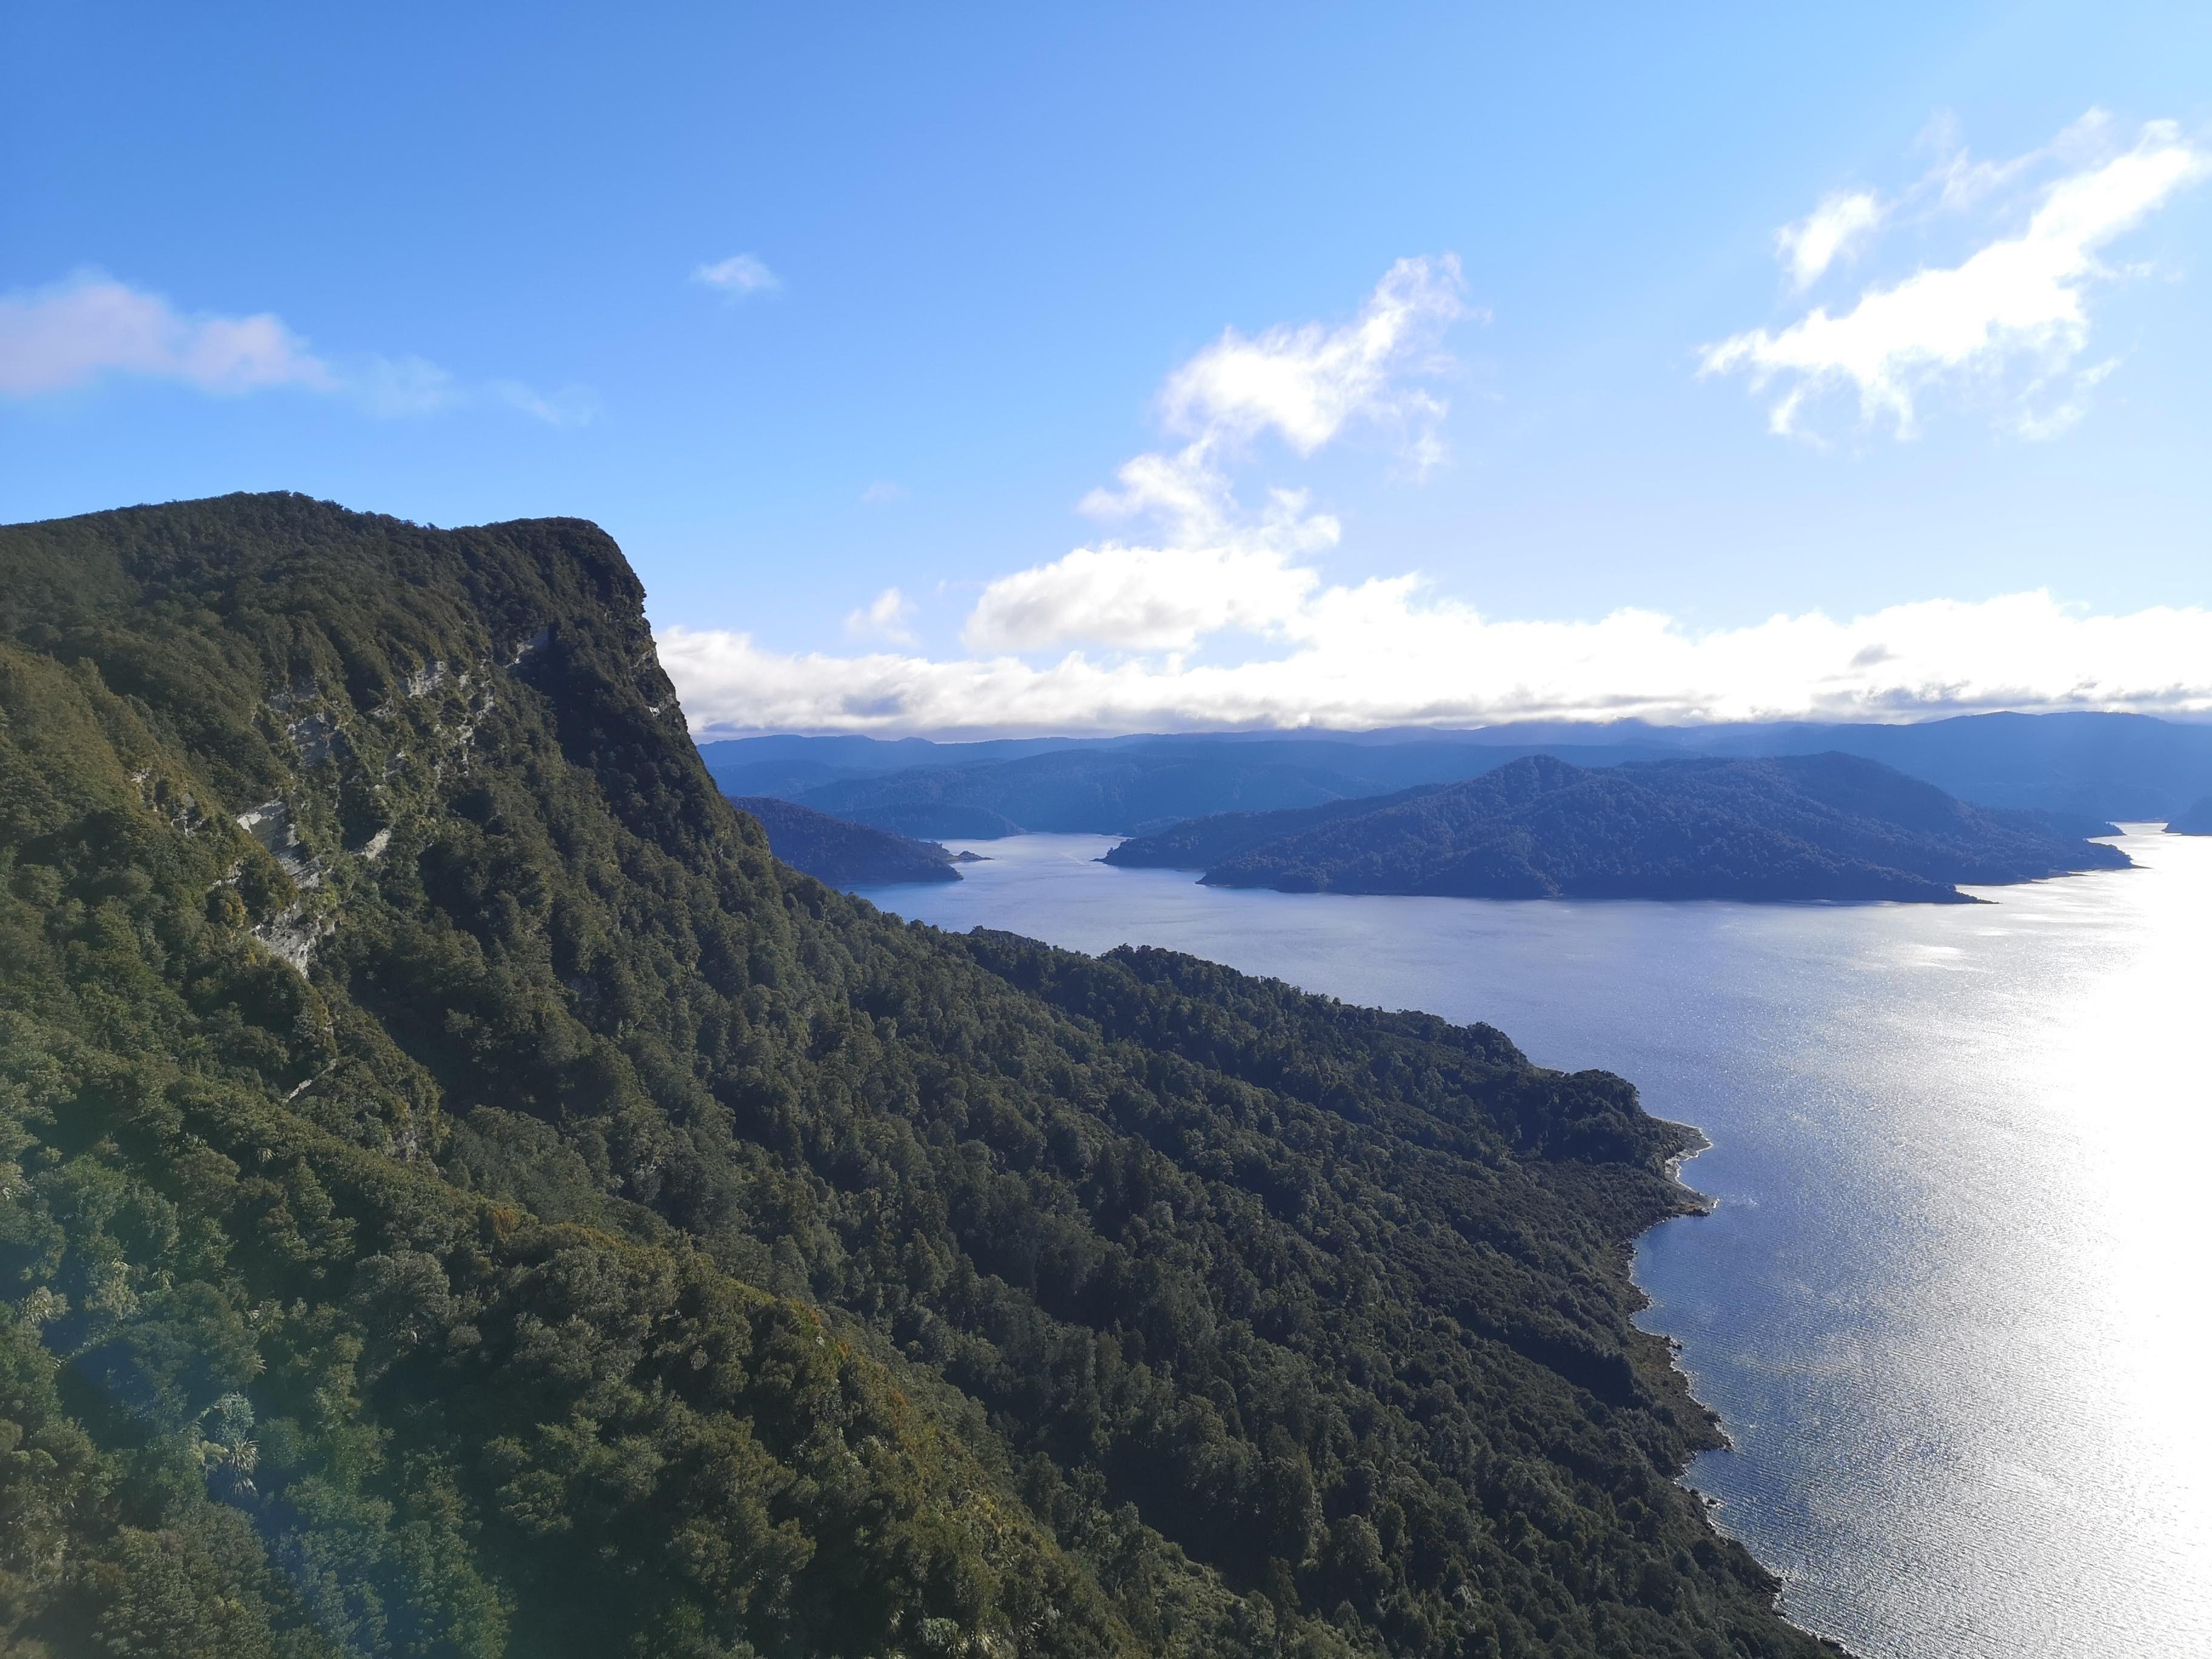 Climbing Up Panekiri Bluff